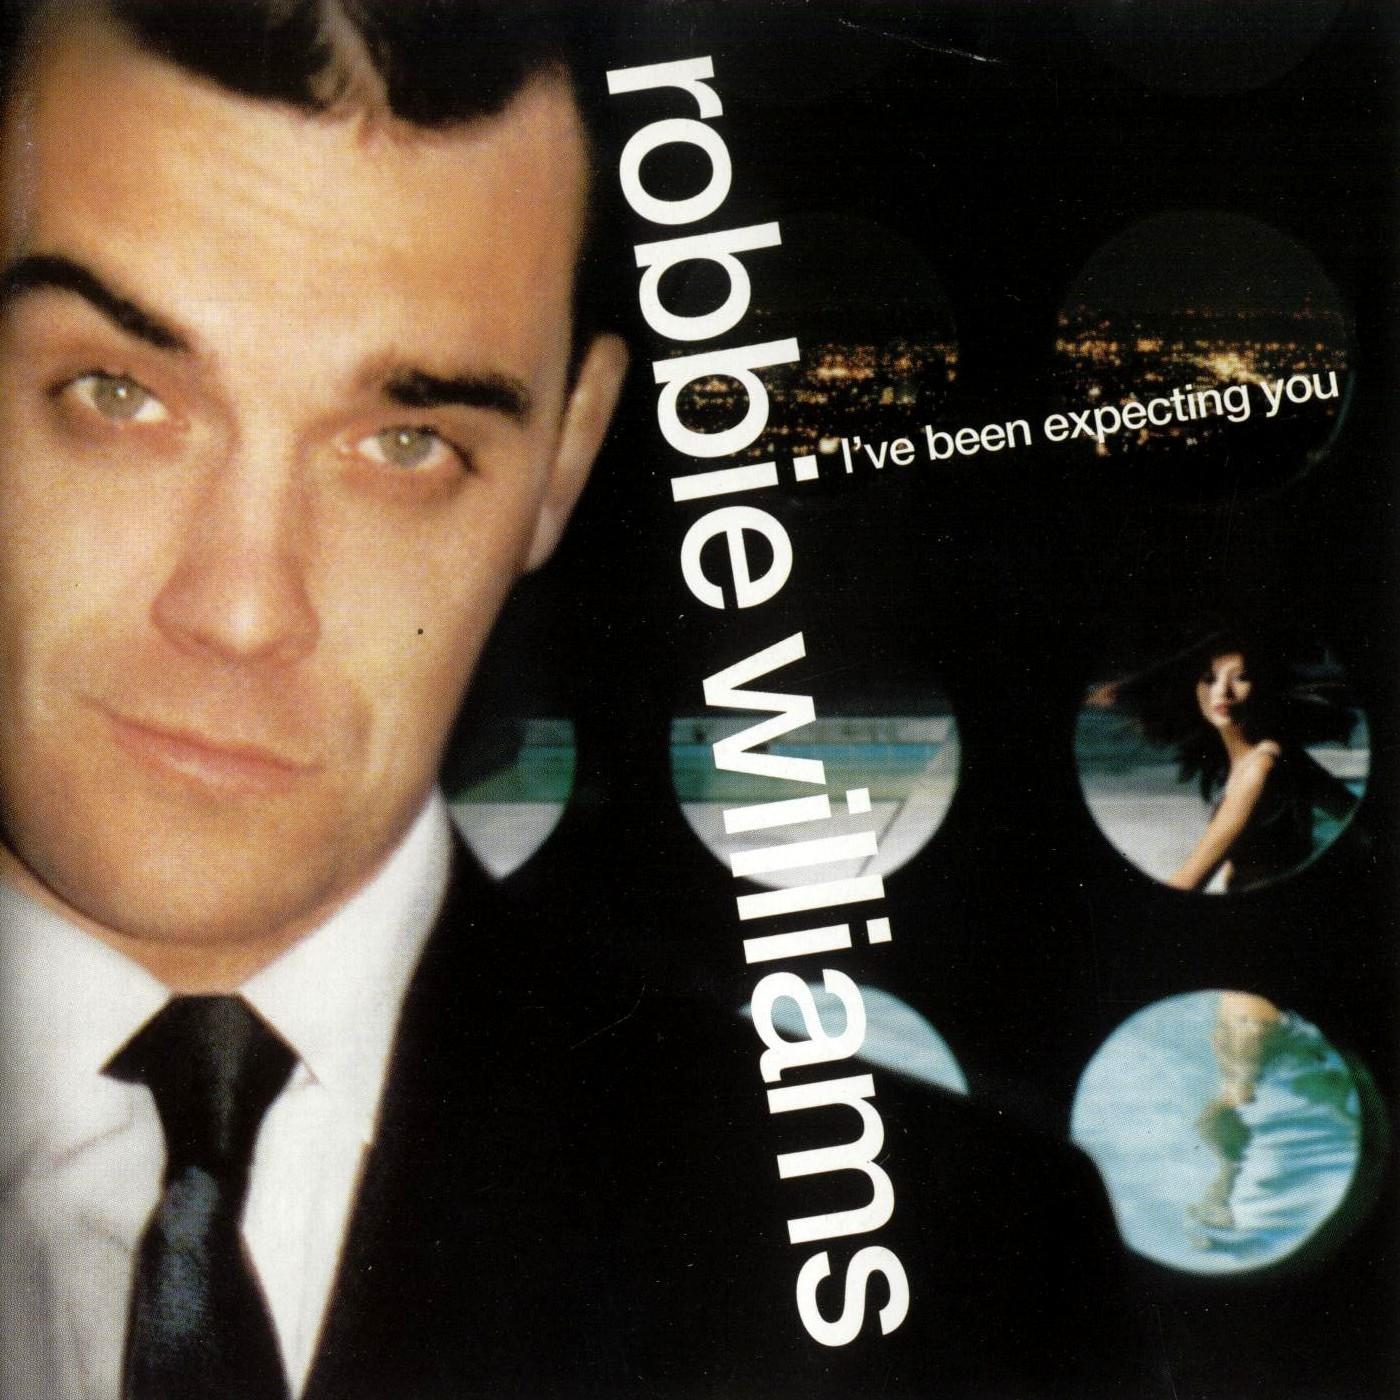 http://1.bp.blogspot.com/_KcZyZd0zaOk/SmBQuVLhe9I/AAAAAAAAA00/CZSRPCEeHLo/s1600/I\'ve+Been+Expecting+You+-+Robbie+Williams+(Front)+[1998].jpg